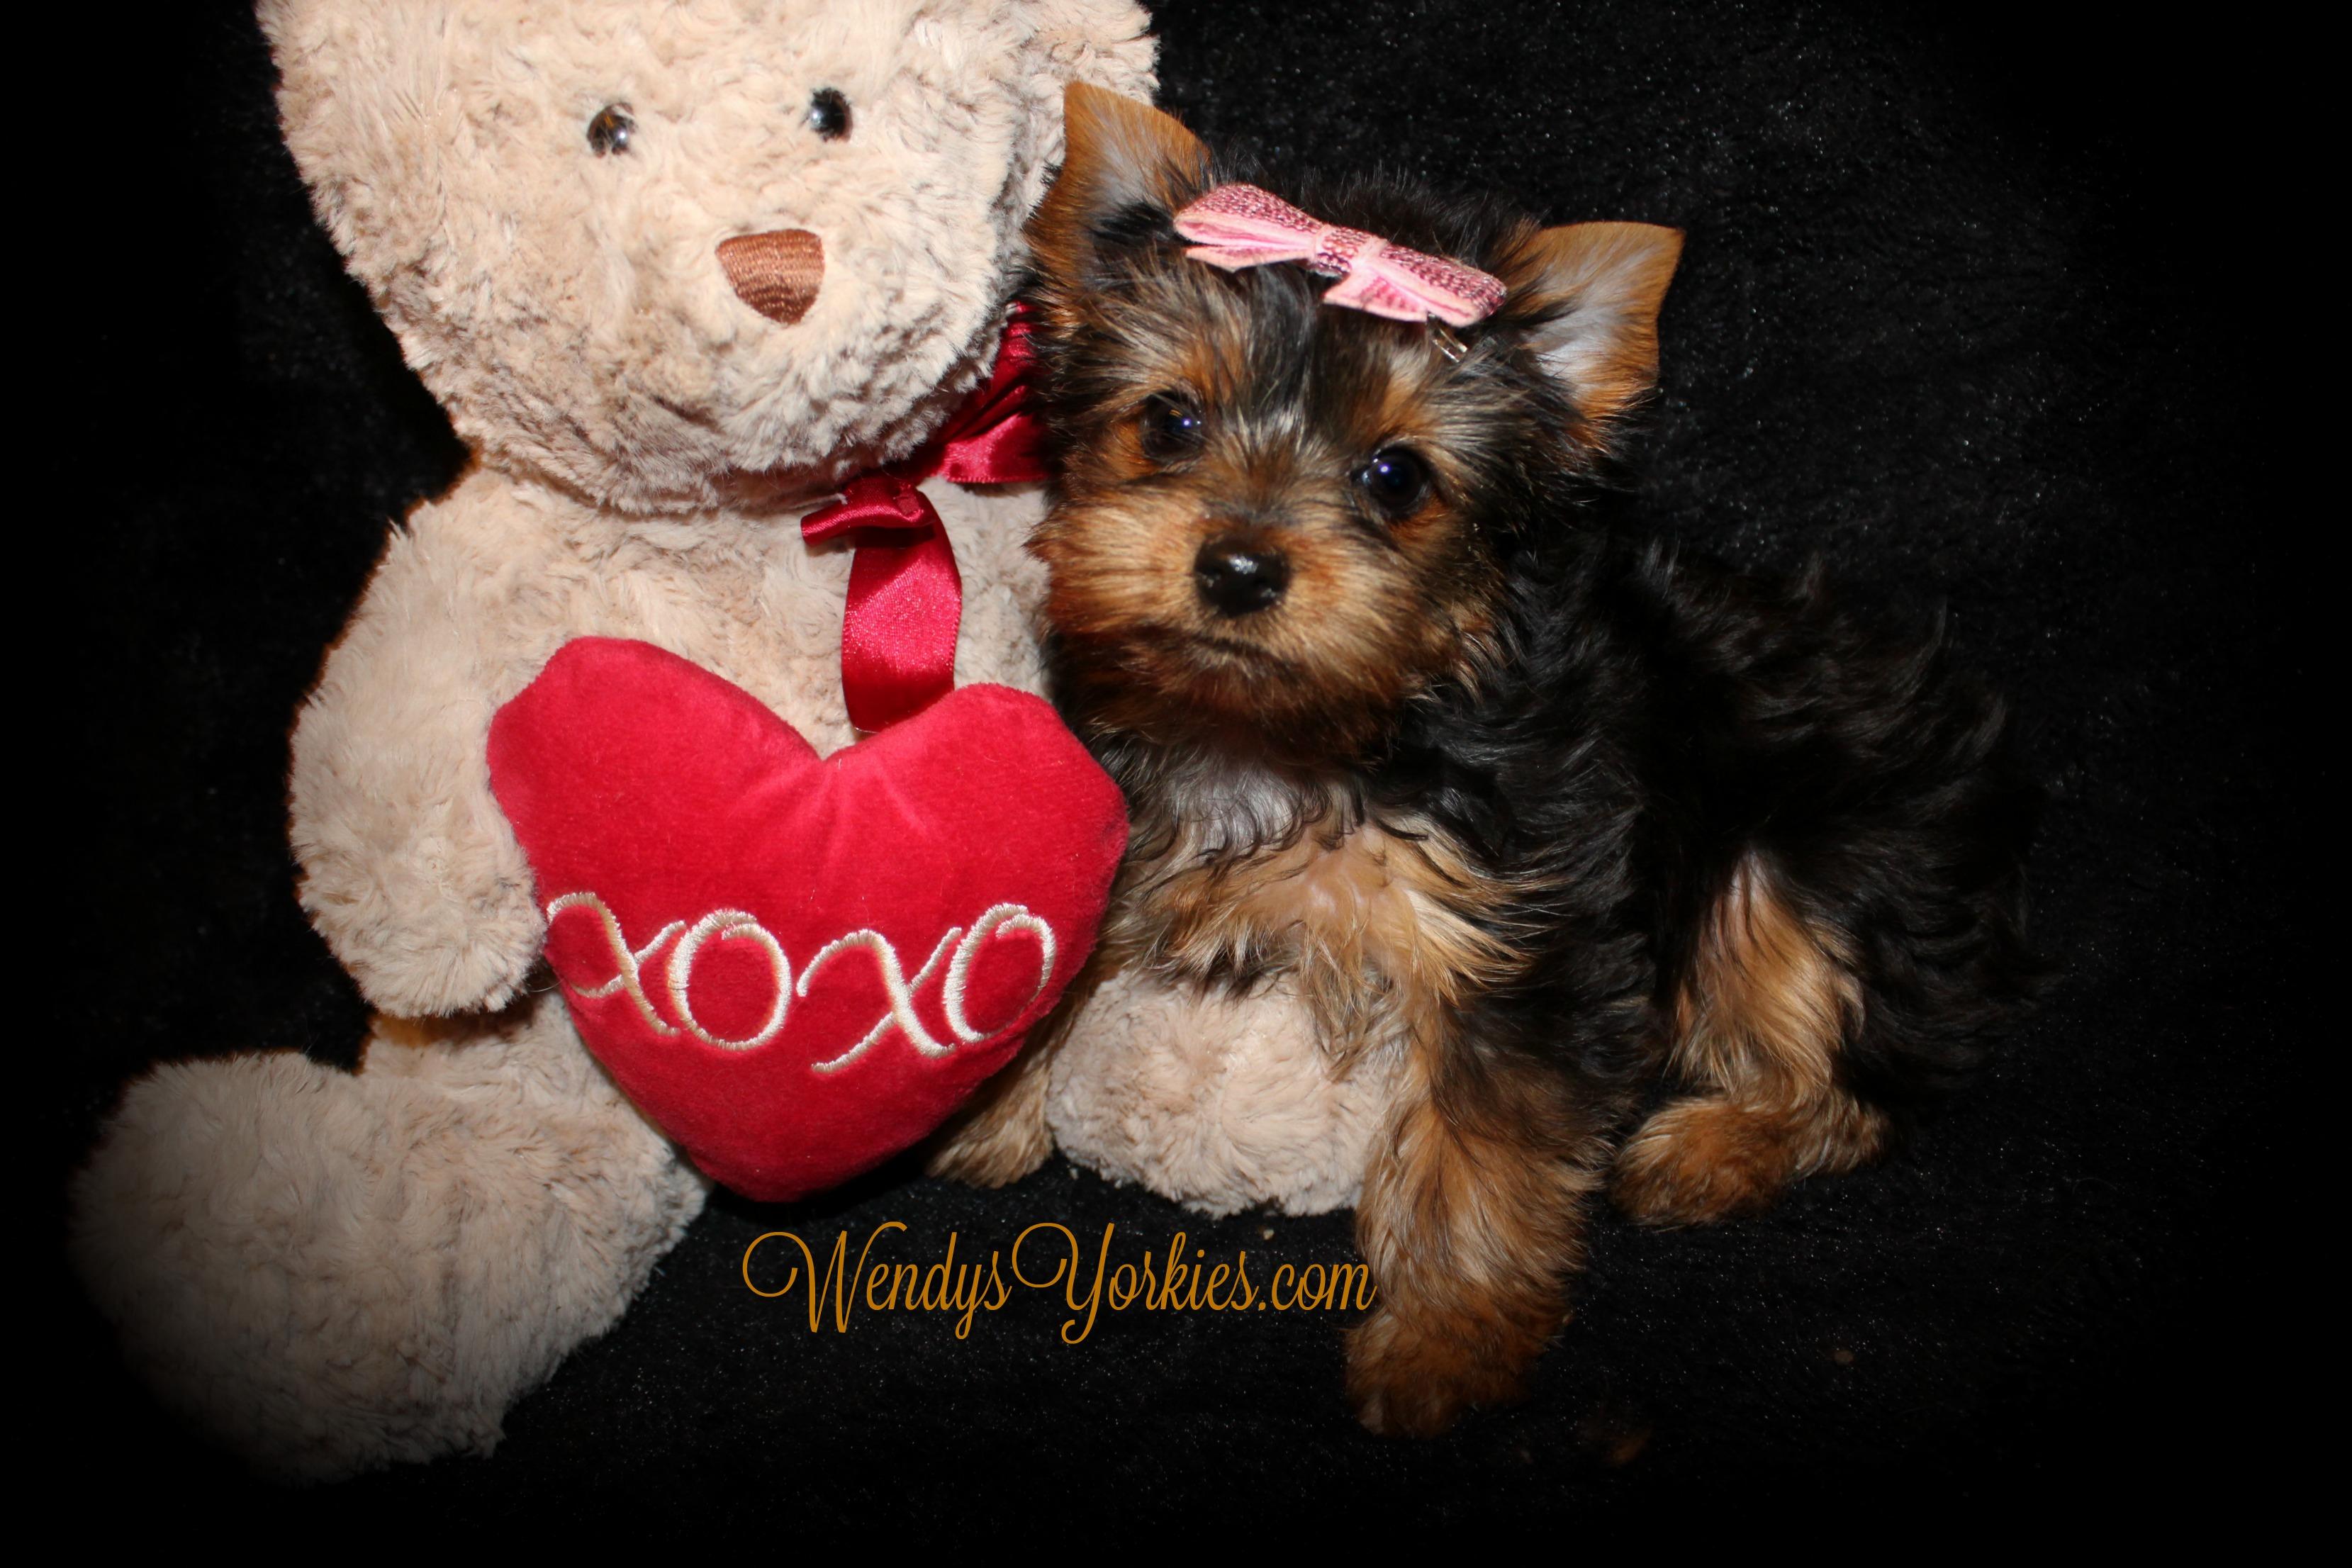 Tiny Teacup Female Yorkie puppy for sale, WendysYorkies.com